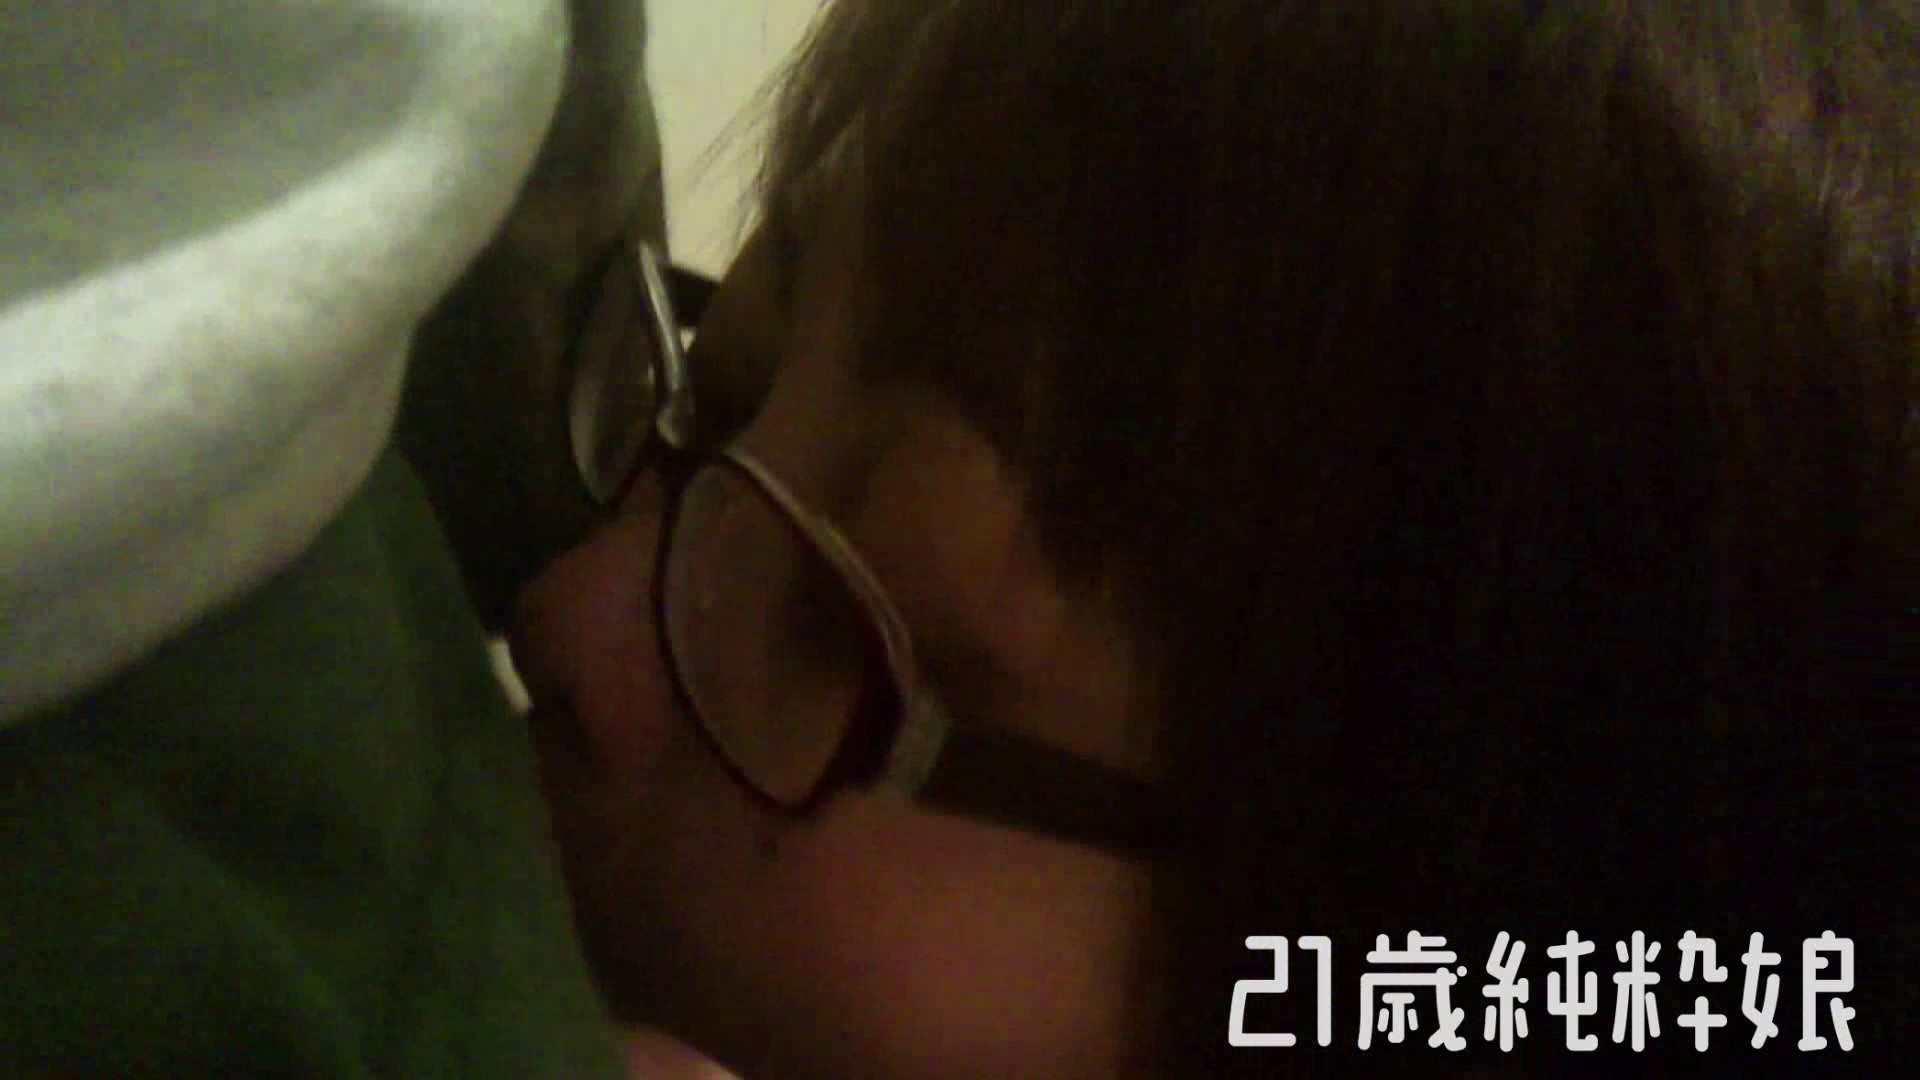 Gカップ21歳純粋嬢第2弾Vol.5 性欲丸出し | 学校  101pic 42